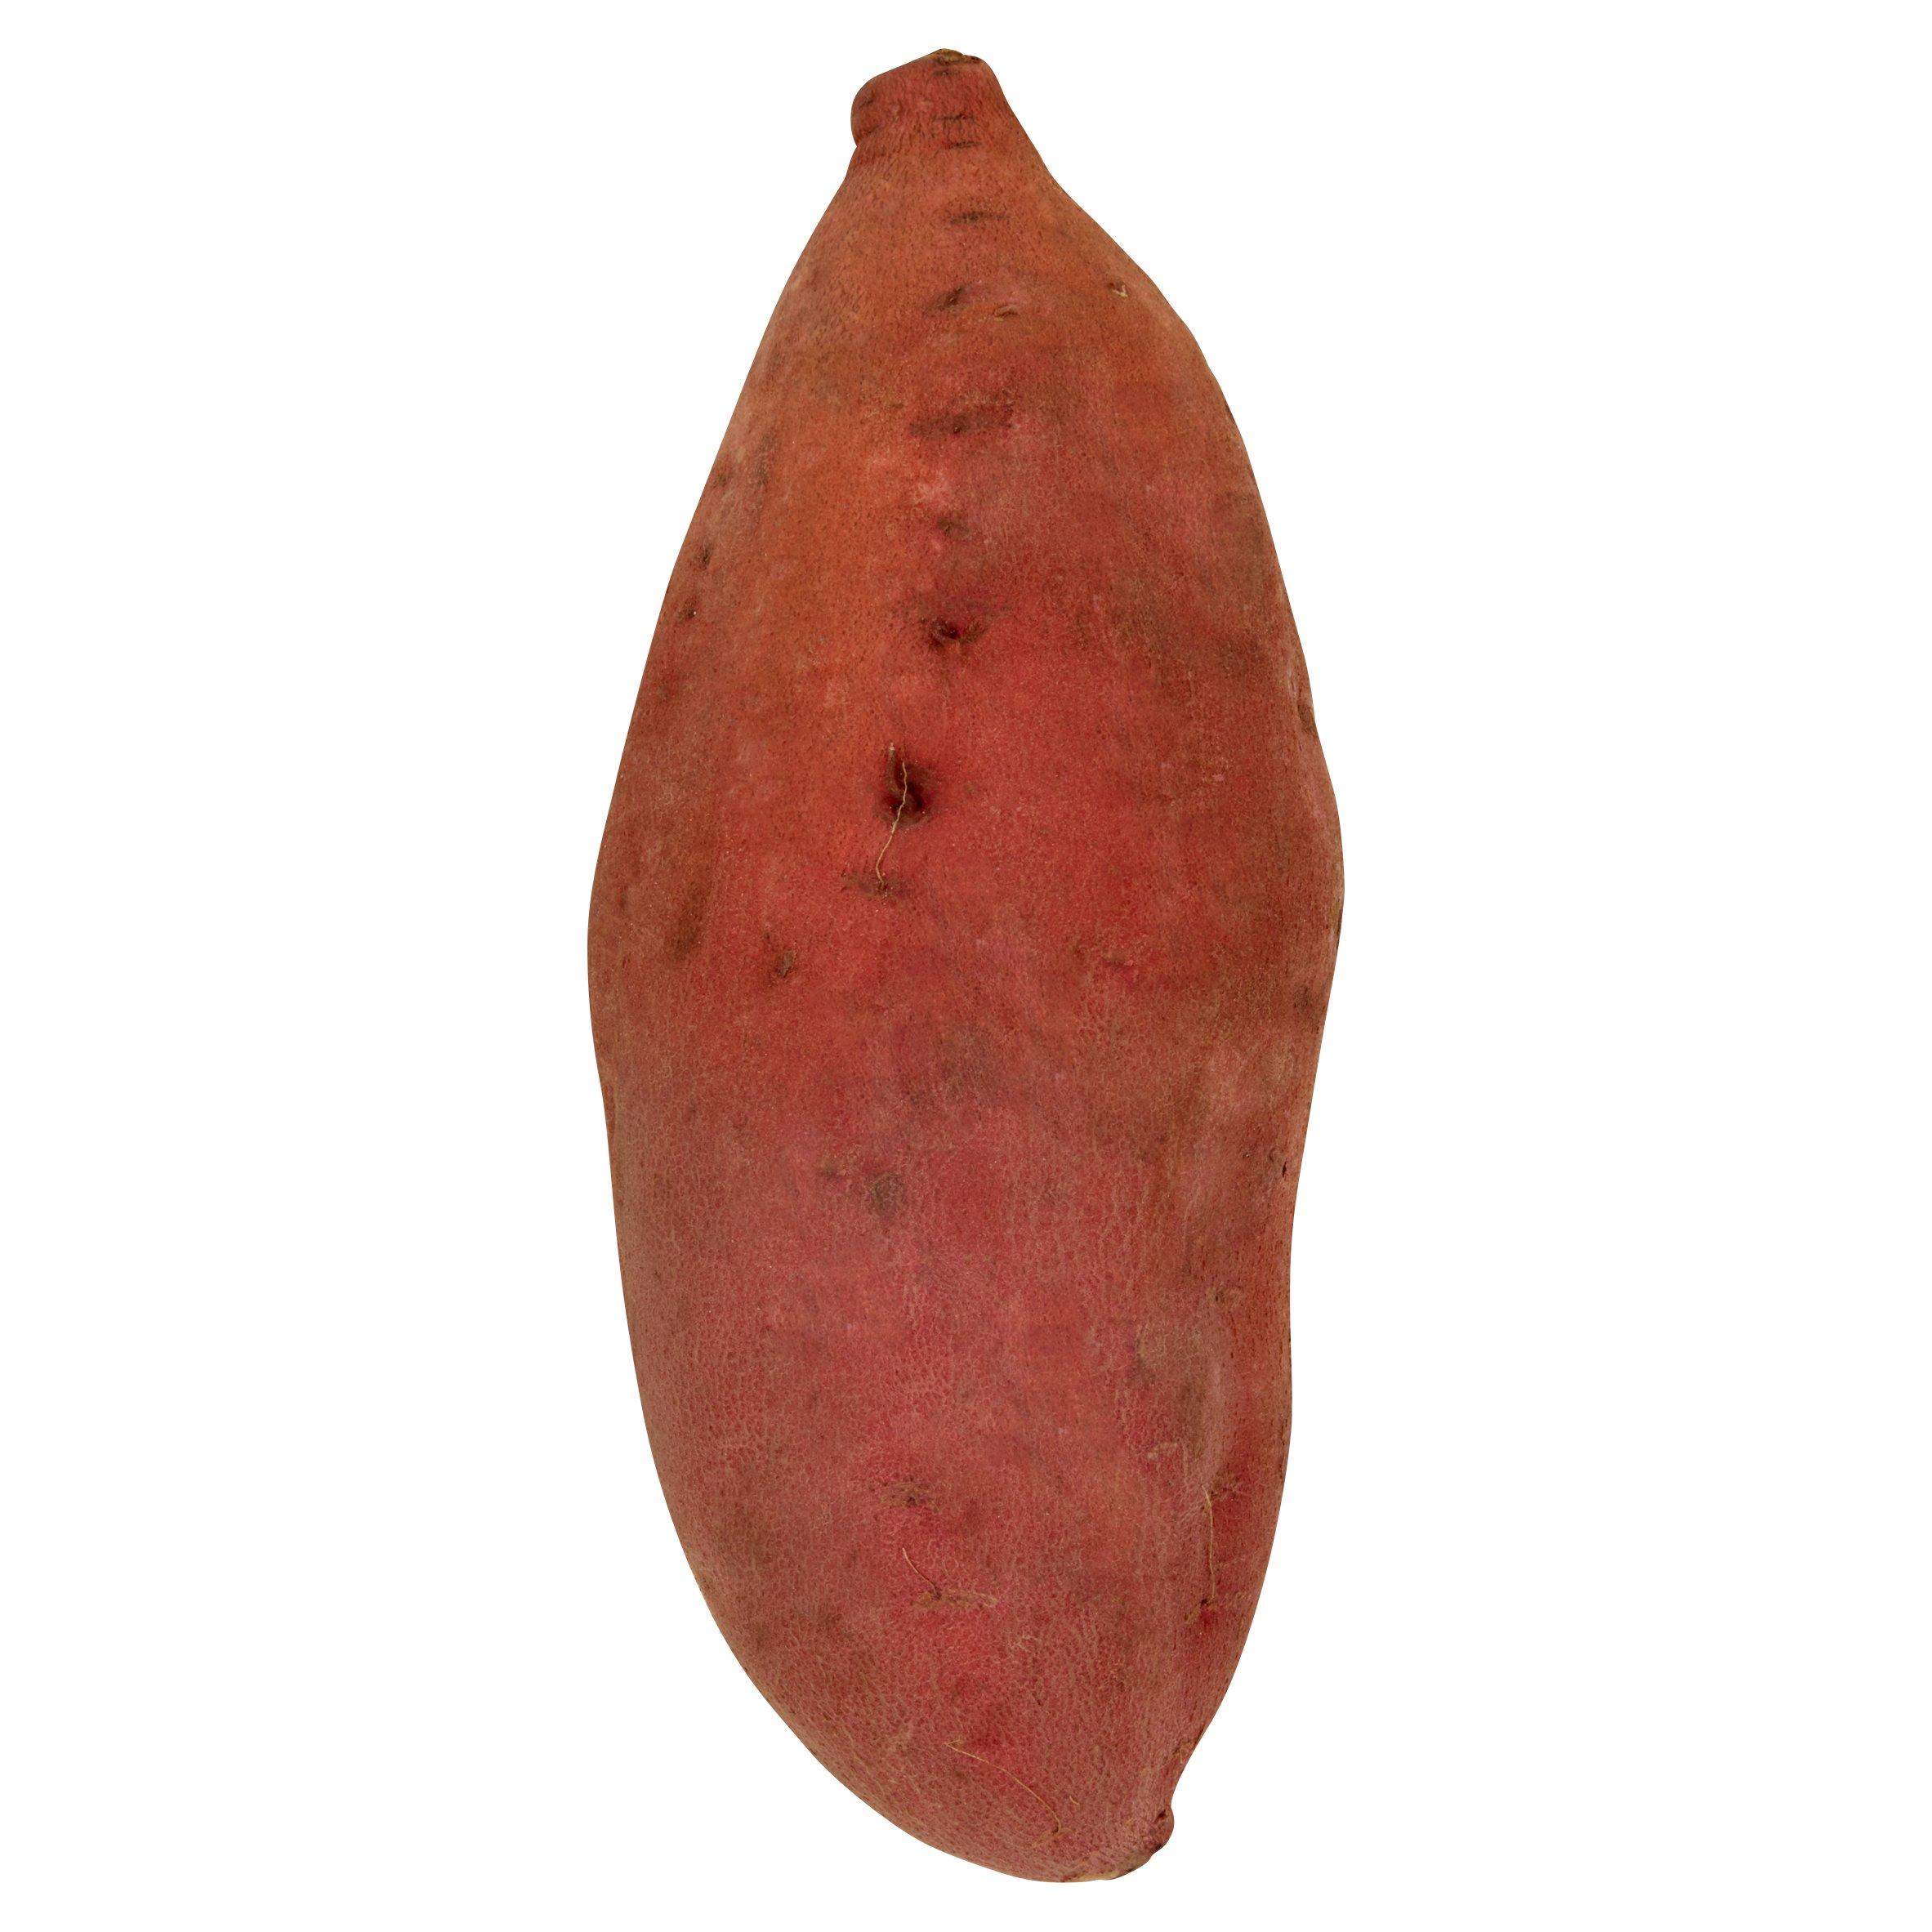 Tesco Sweet Potatoes Loose Class 1